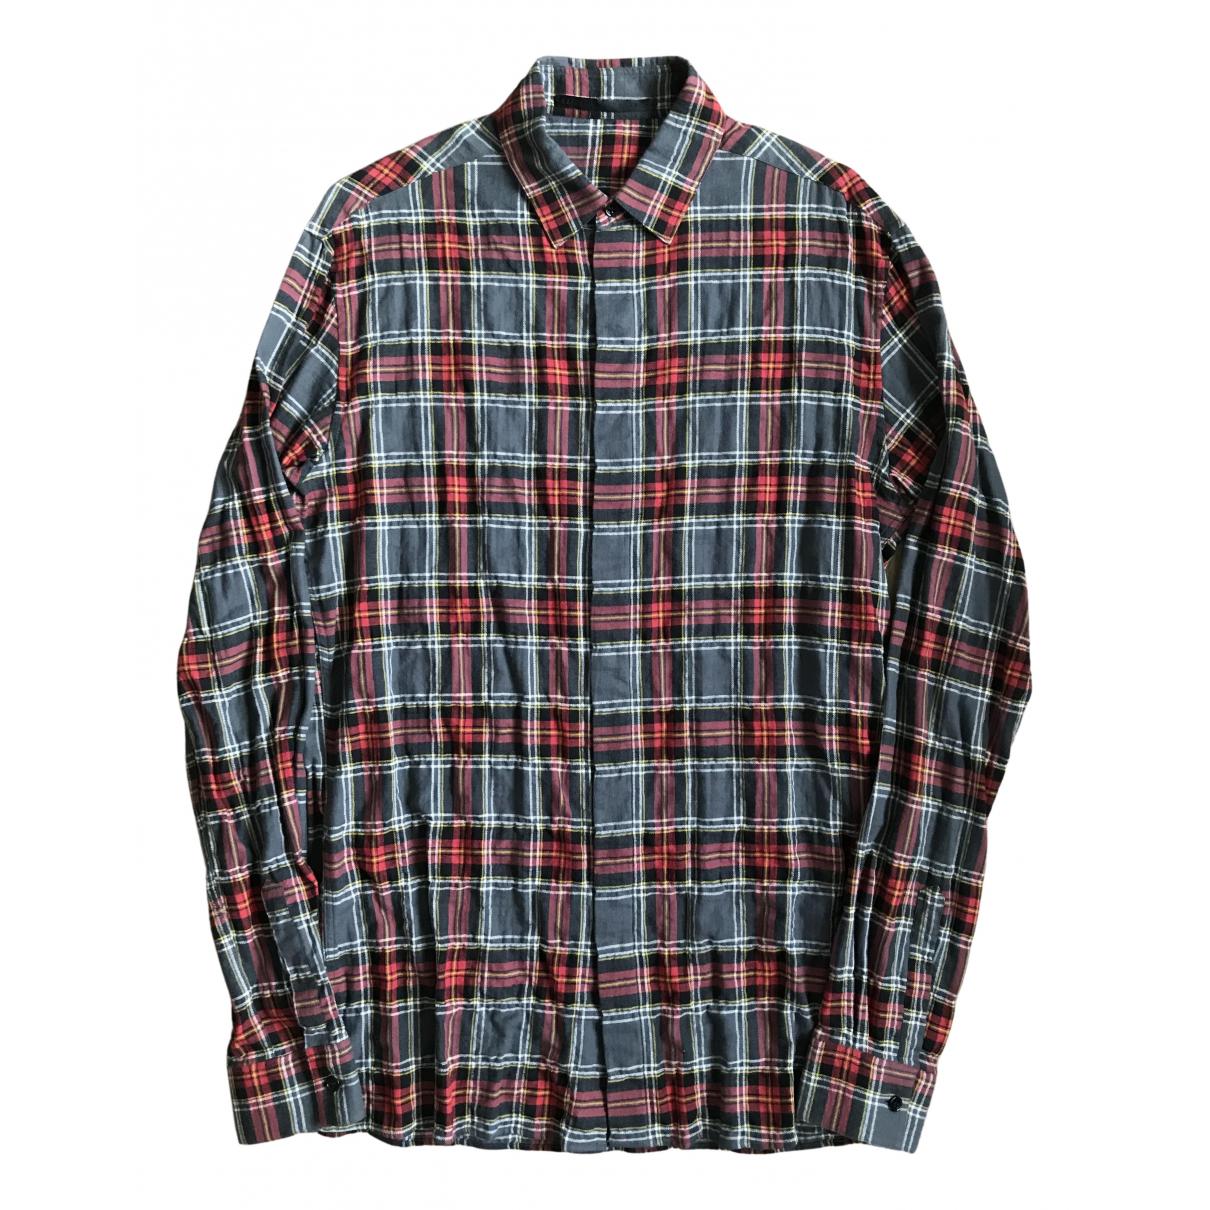 Haider Ackermann N Grey Cotton Shirts for Men S International